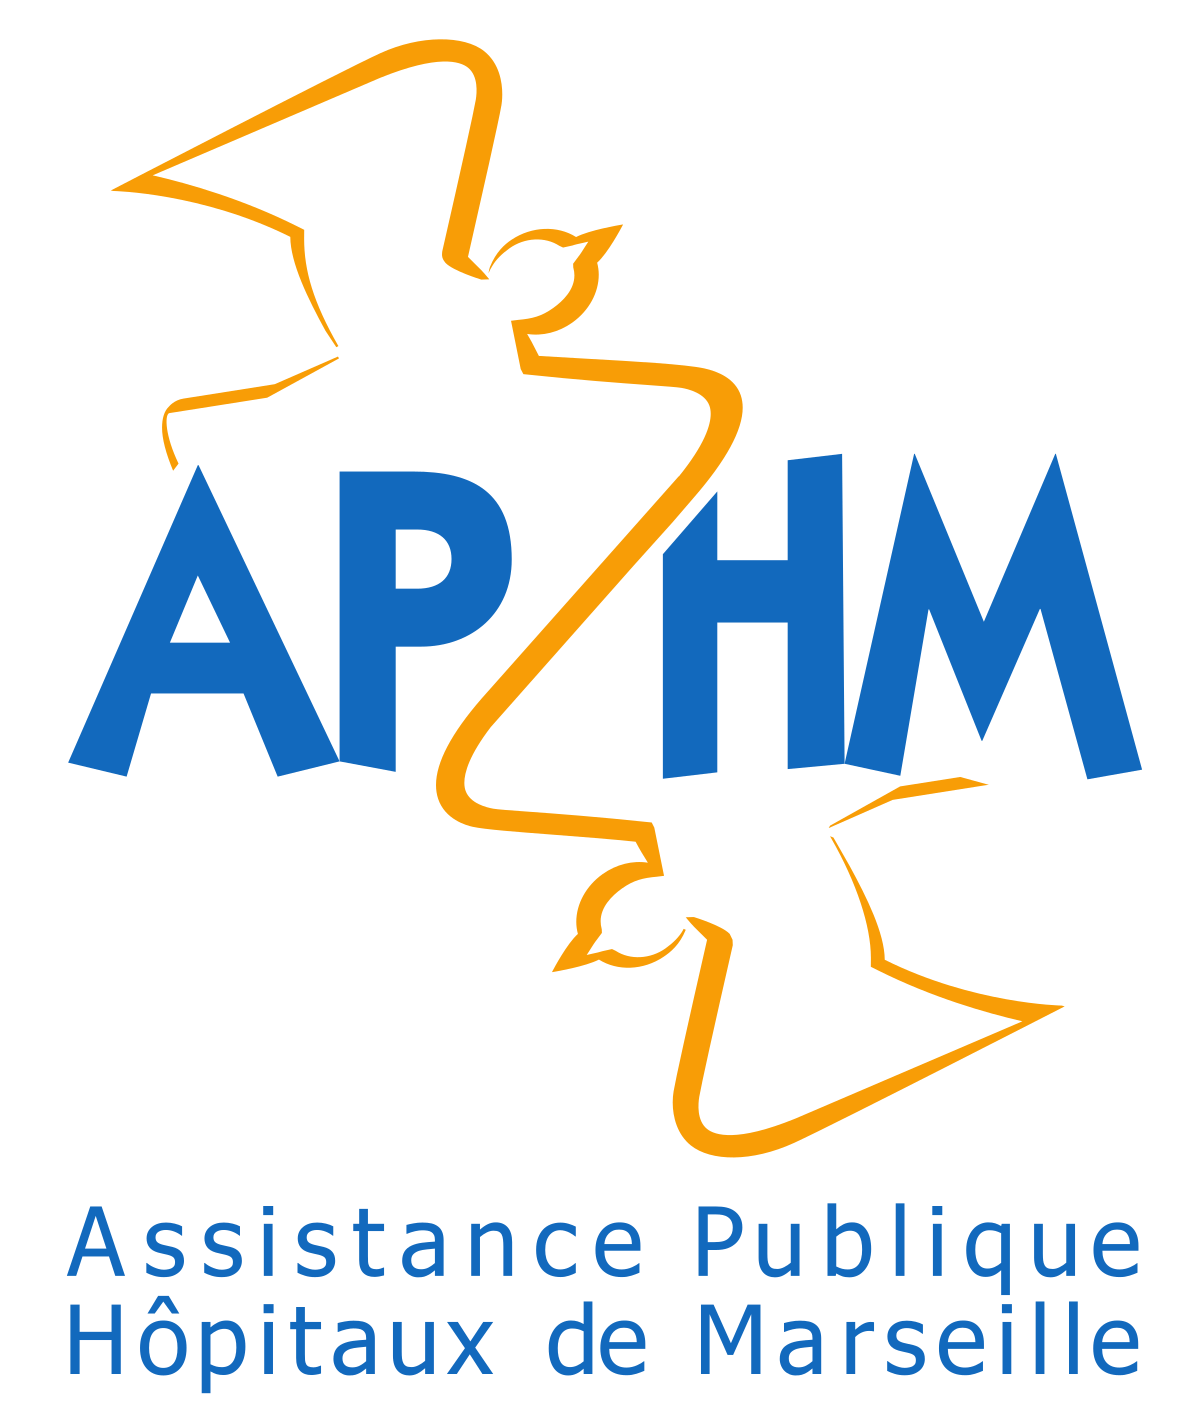 Logo hôpitaux de marseille